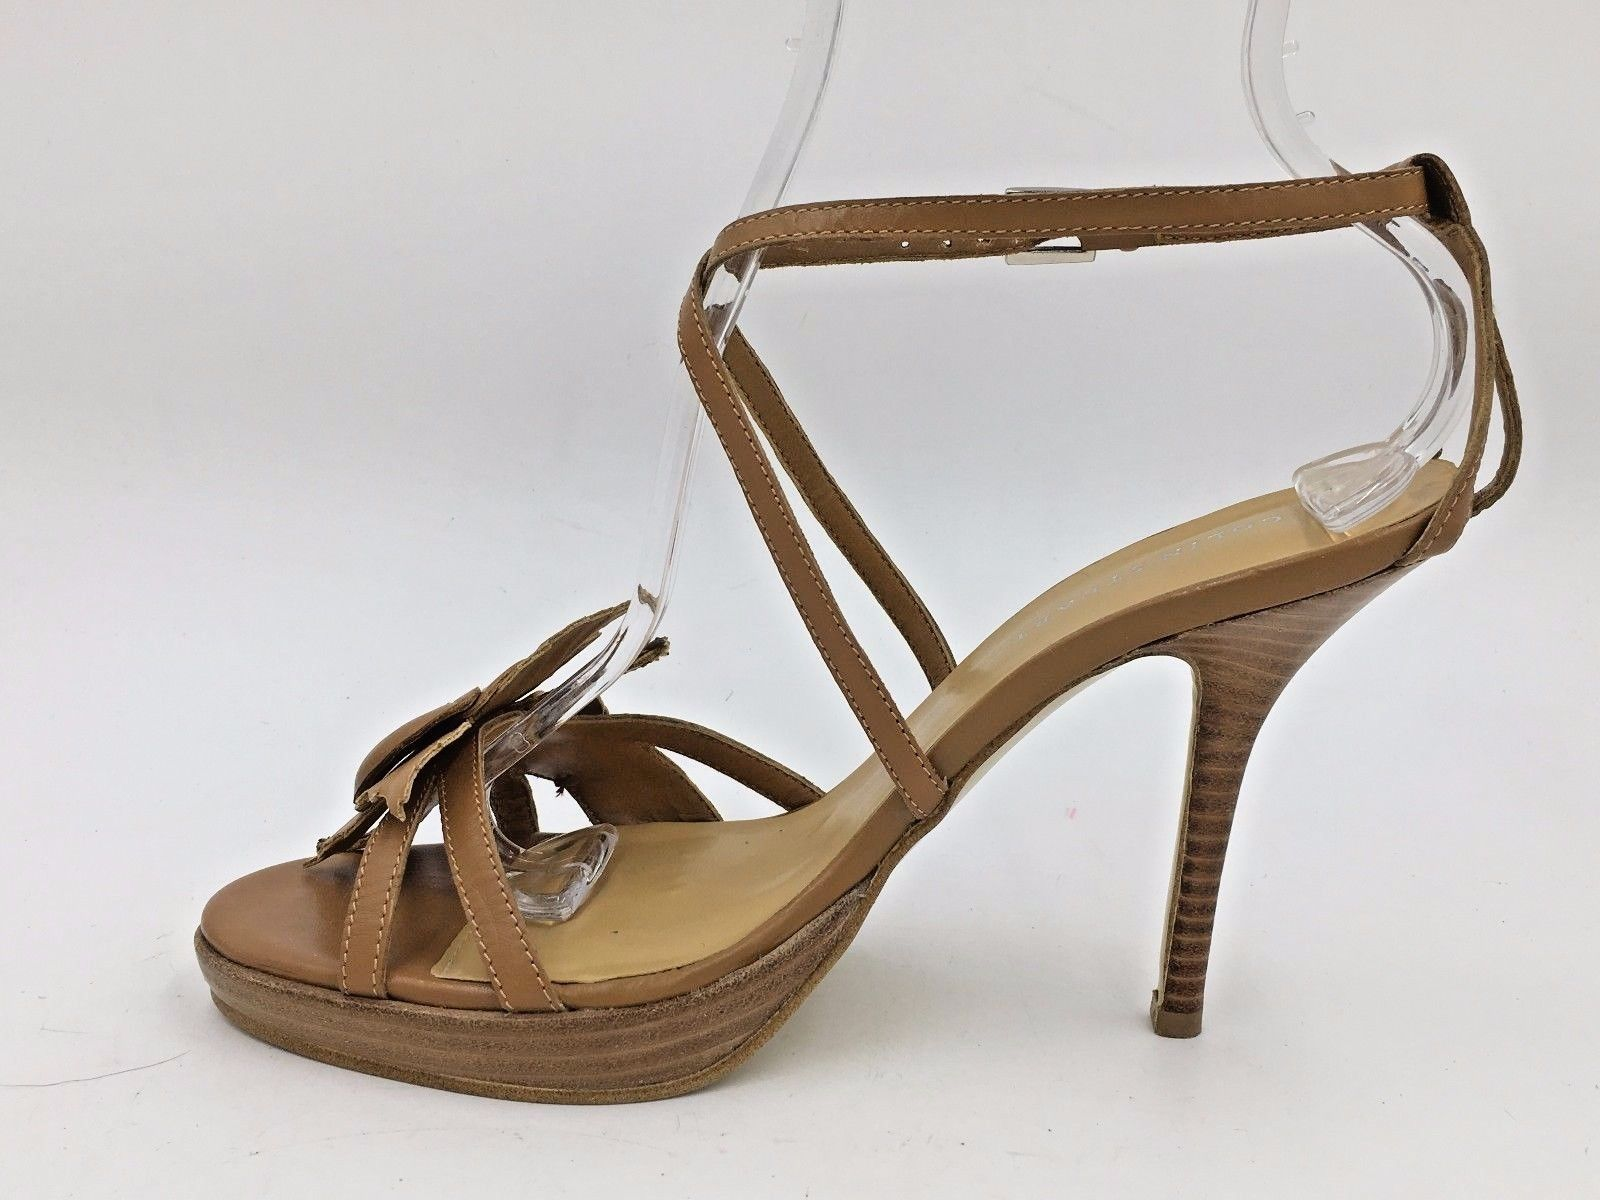 33a3d2a95dcd1a Colin Stuart Brown Genuine Leather Flower Sandals Stiletto Heels size 8M  NWOB B3